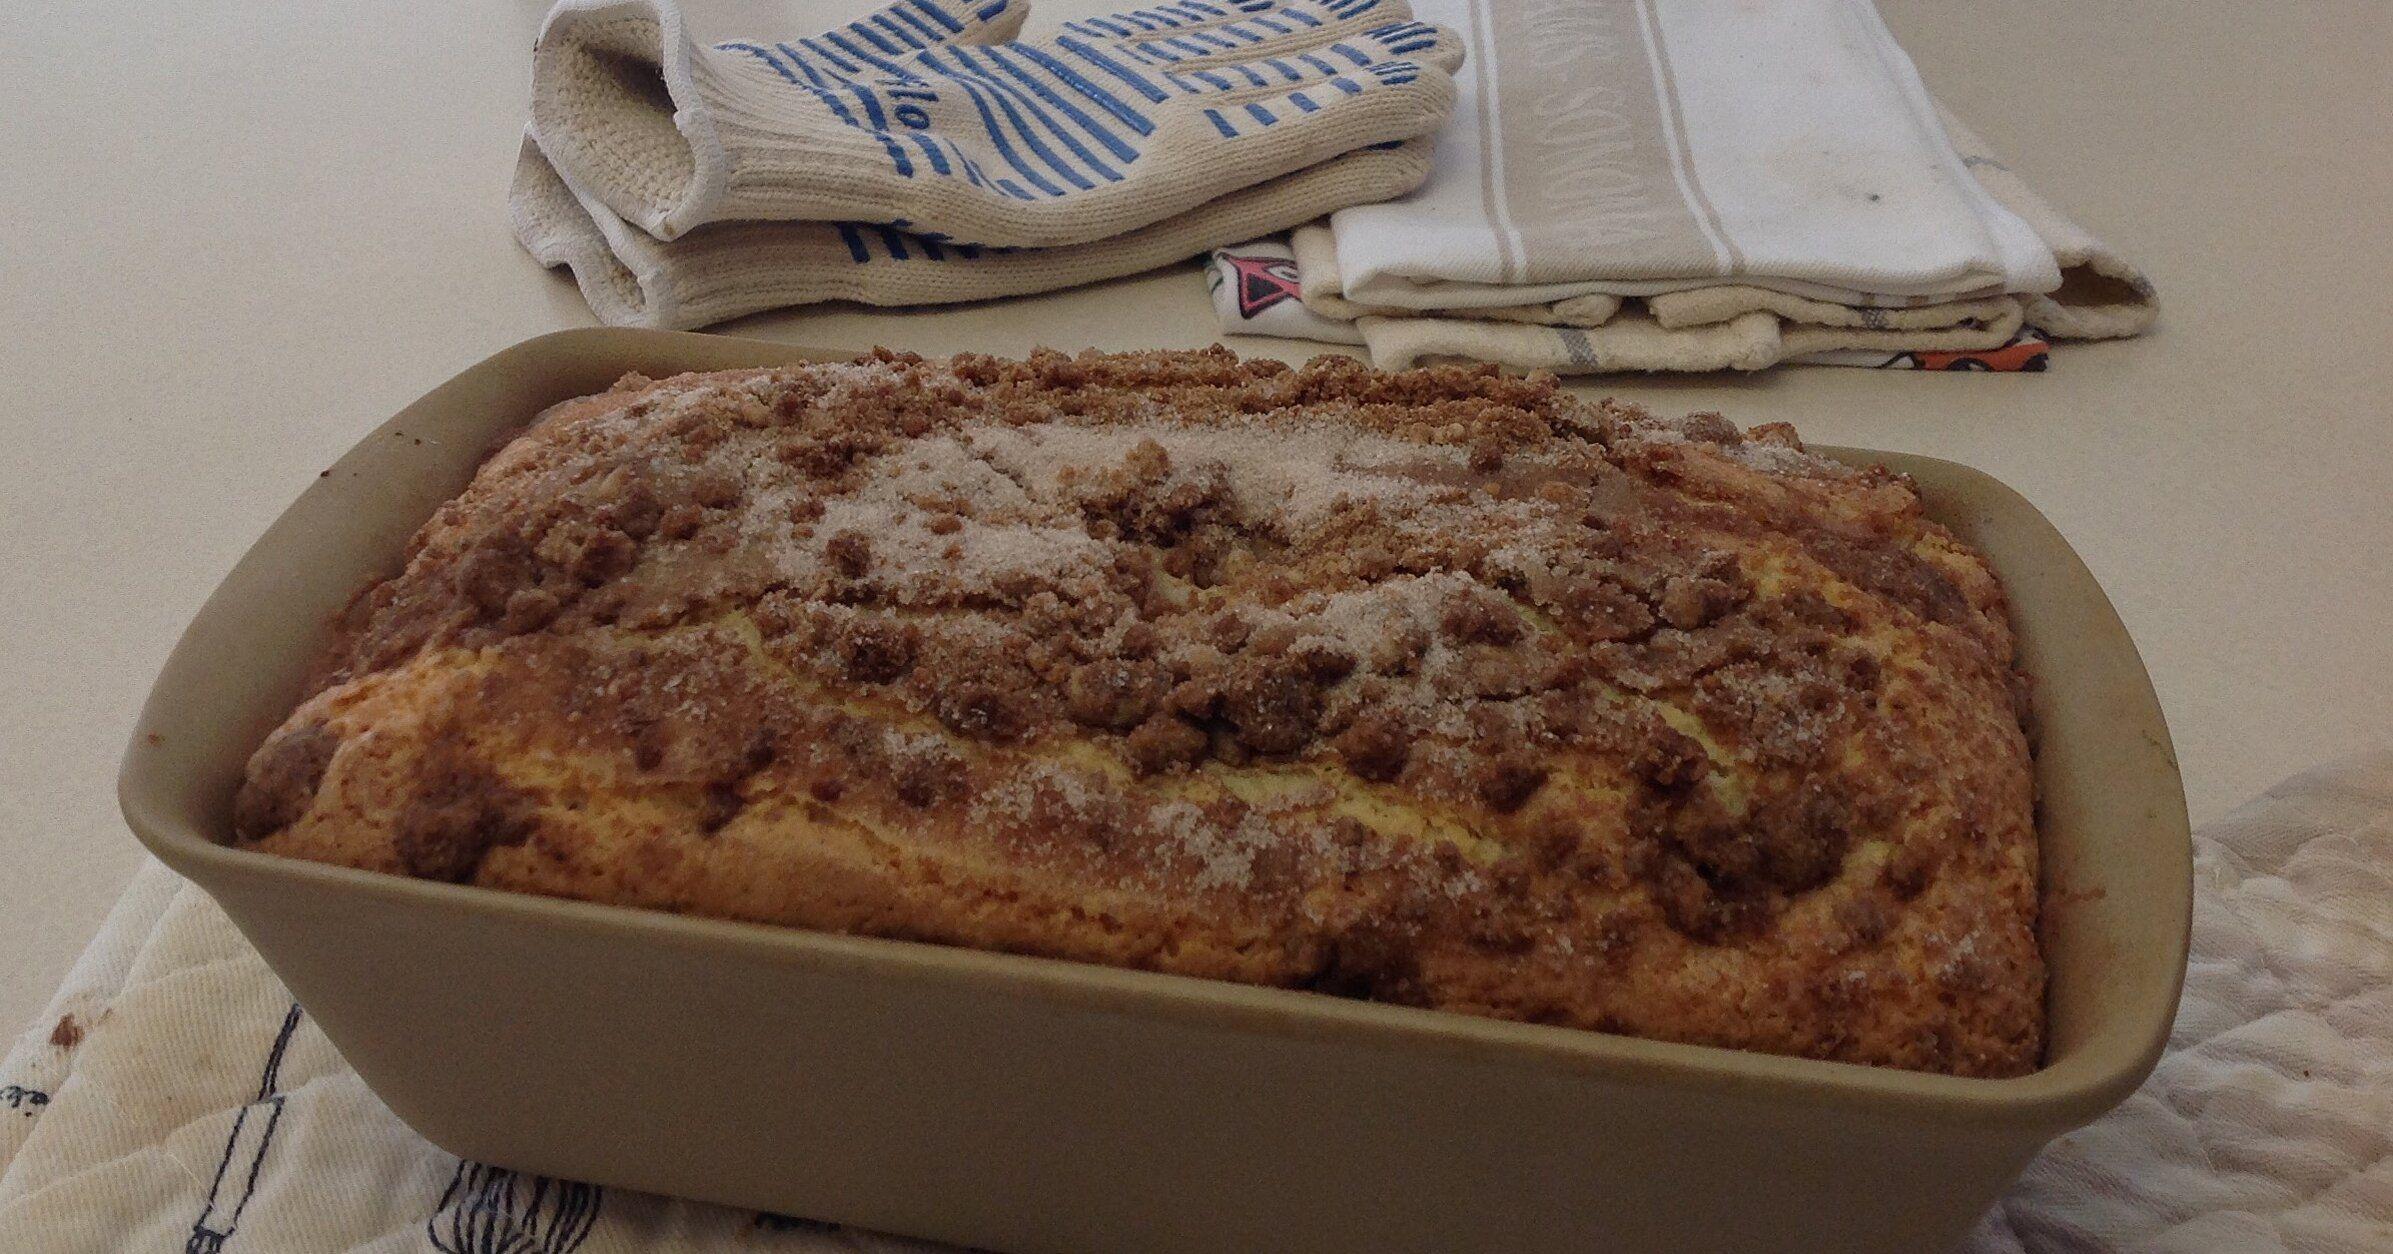 Sour Cream Coffee Cake Iii Recipe In 2020 Sour Cream Coffee Cake Sour Cream Coffee Cake